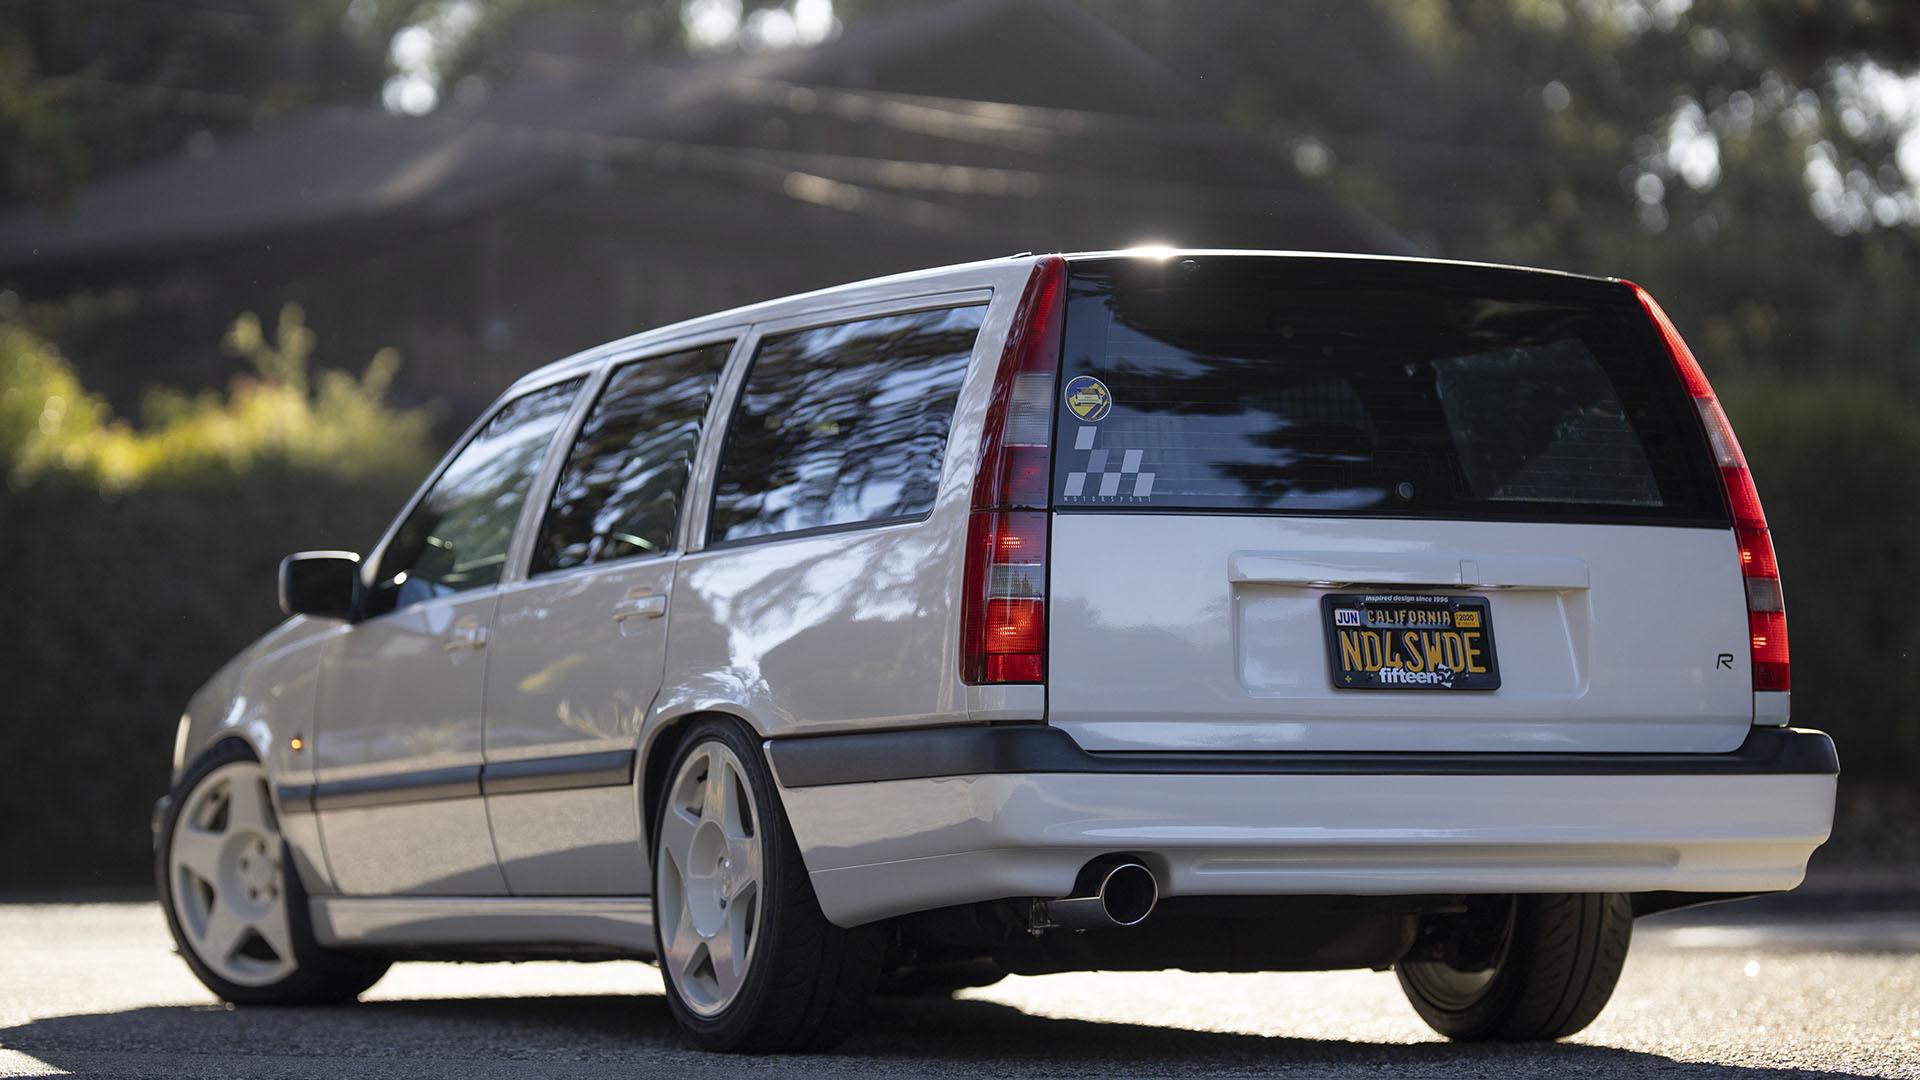 Hot Wheeled Wagon – Volvo 850 R Estate